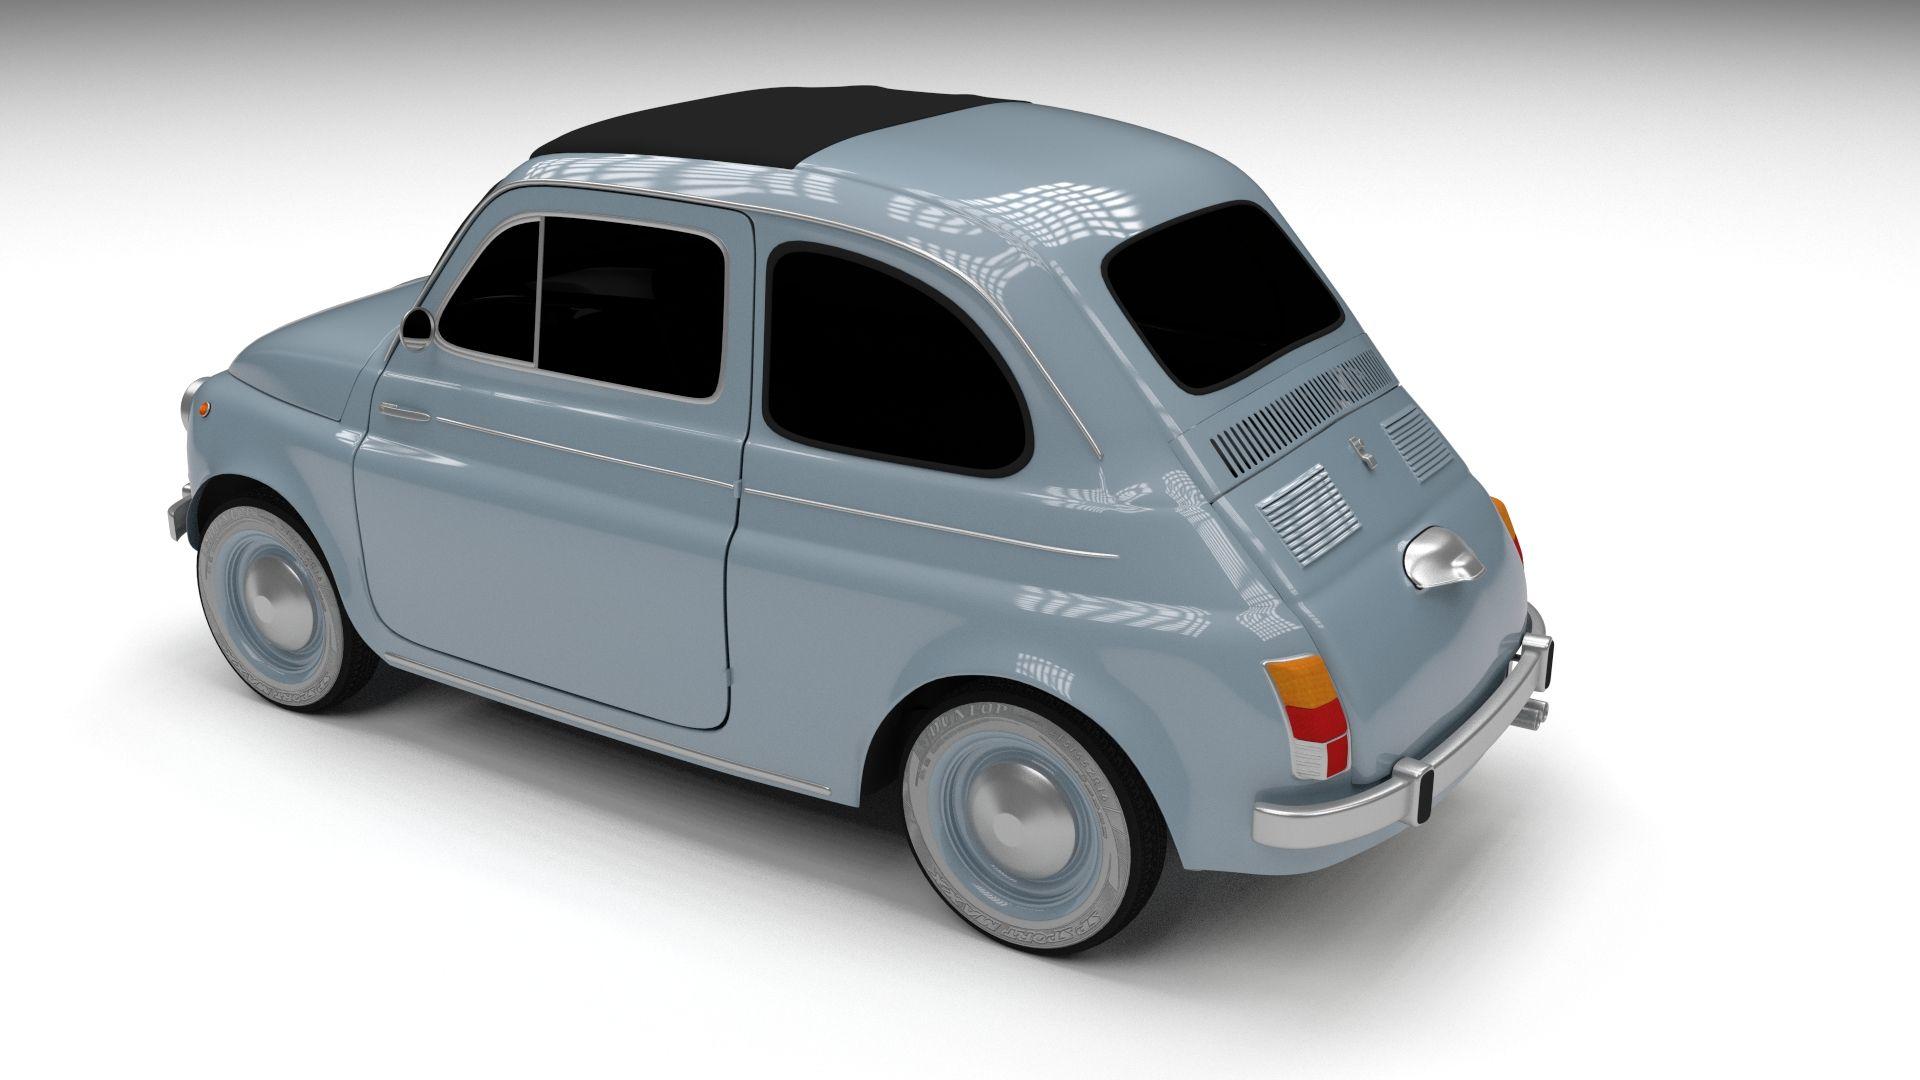 Fiat 500 Nuova 1957 Hdri 3d Model With Images Fiat 500 Fiat